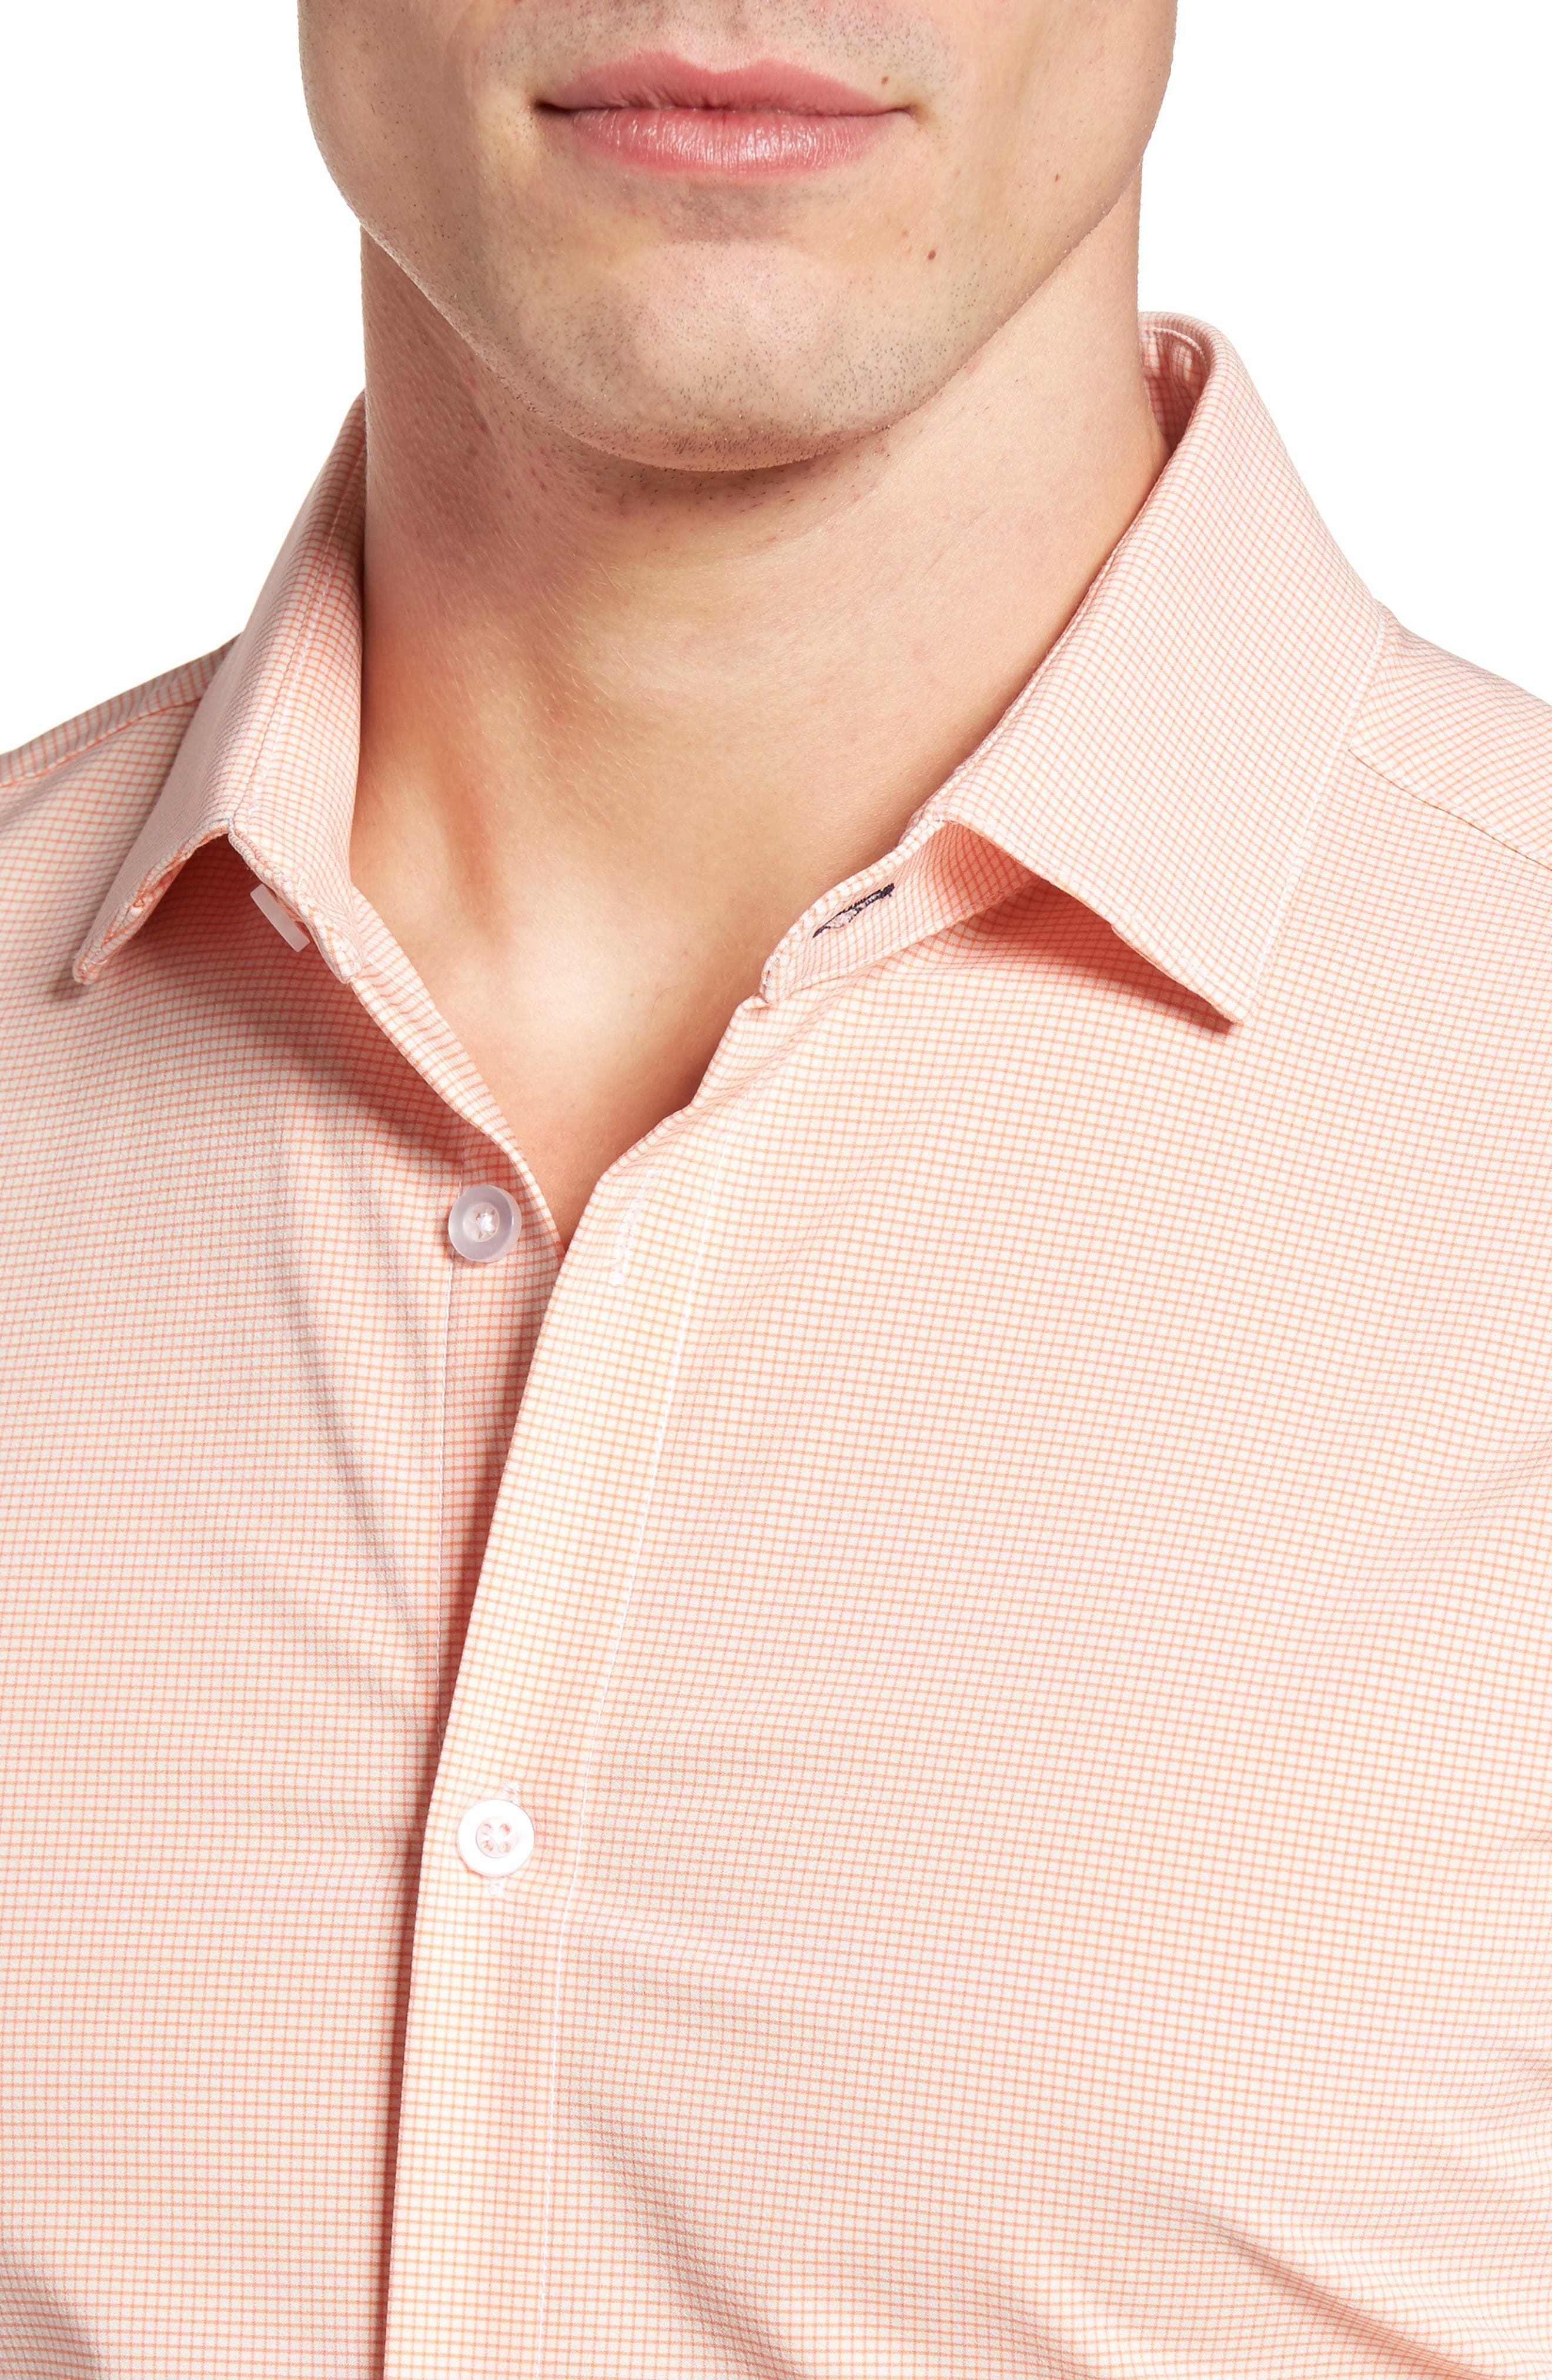 Charles Microcheck Performance Sport Shirt,                             Alternate thumbnail 4, color,                             Peach